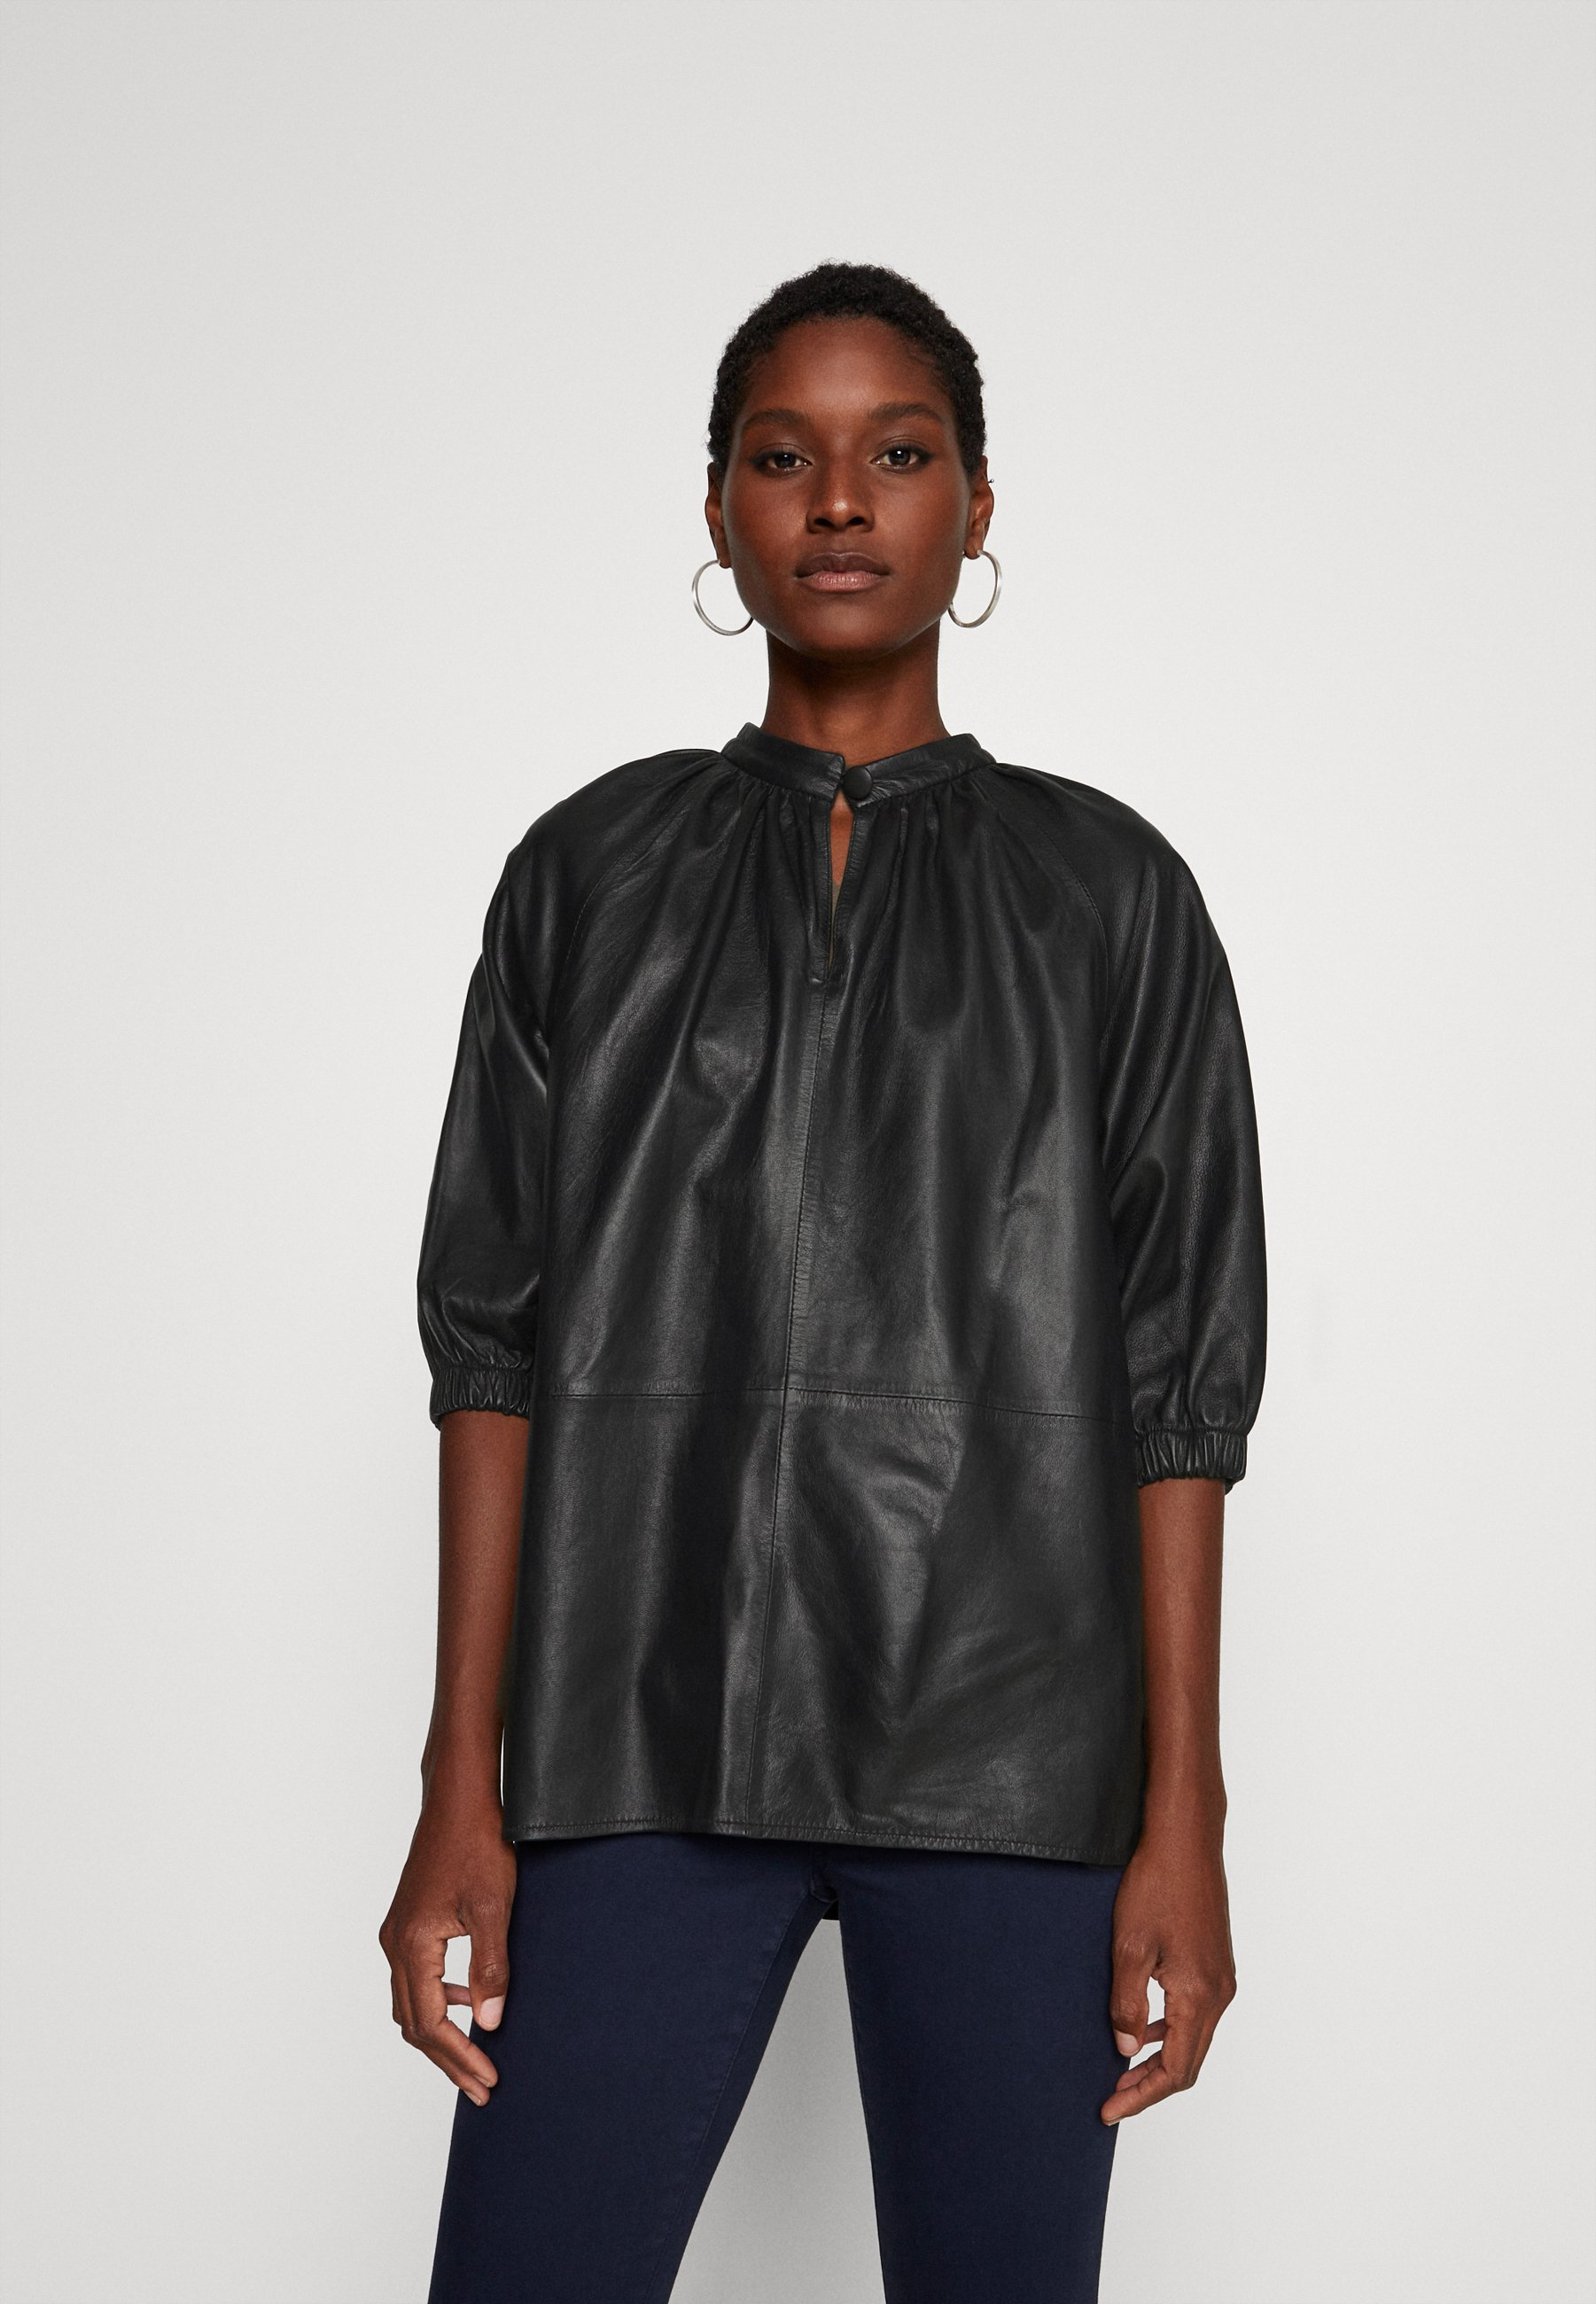 Big Discount Women's Clothing Ibana TANJA Blouse black 8HDSt4b5R